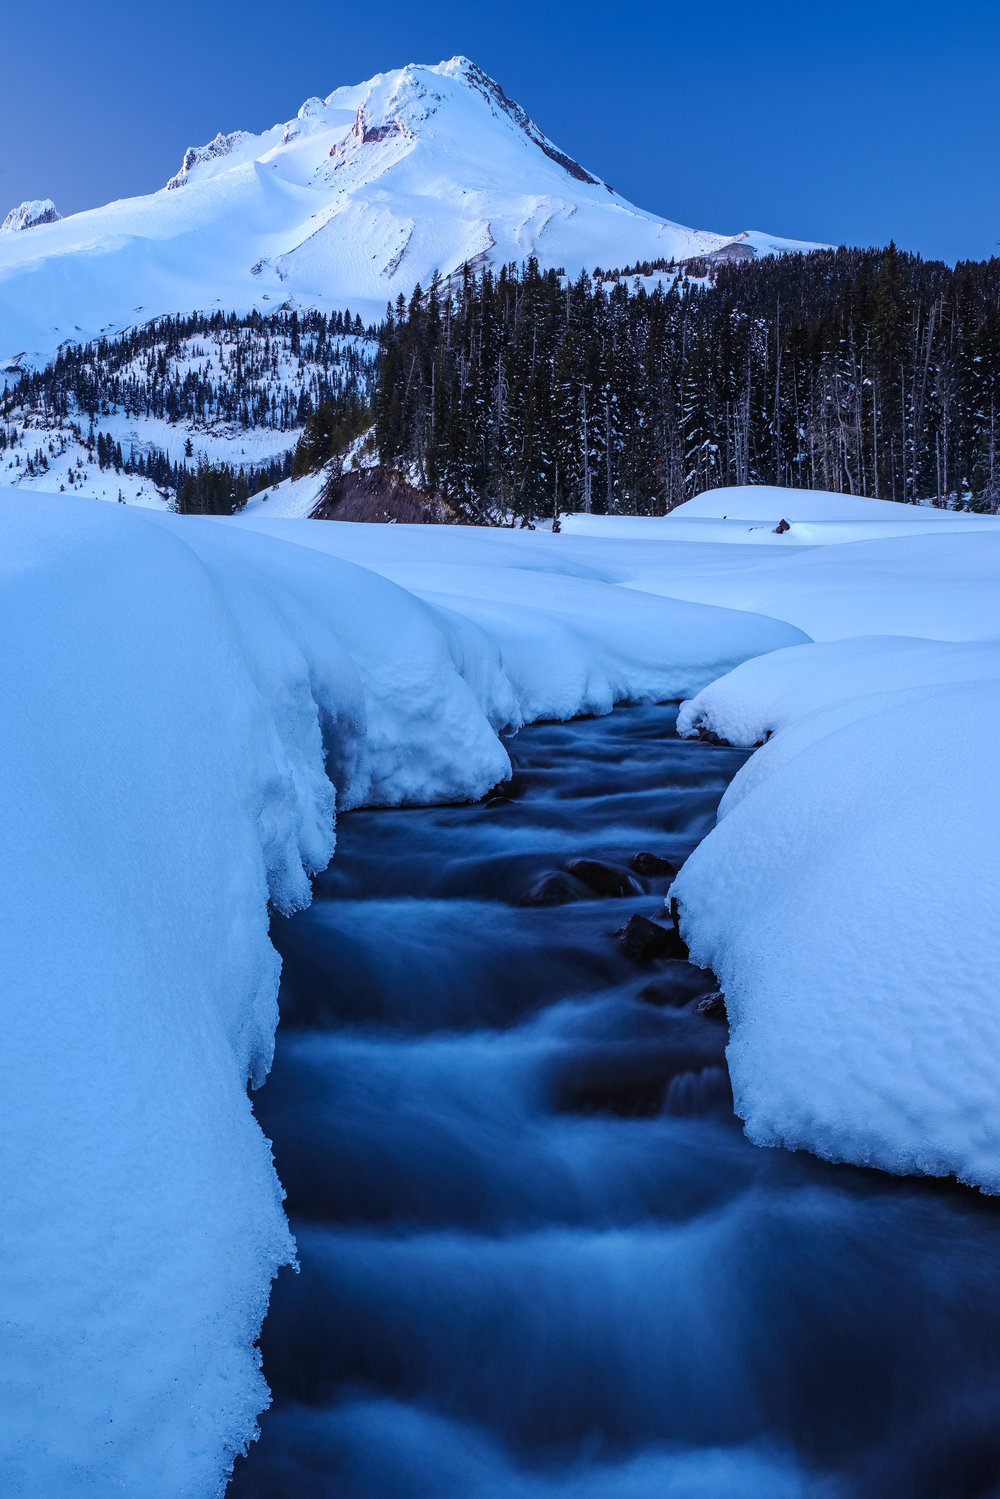 Pillowy Soft Snow